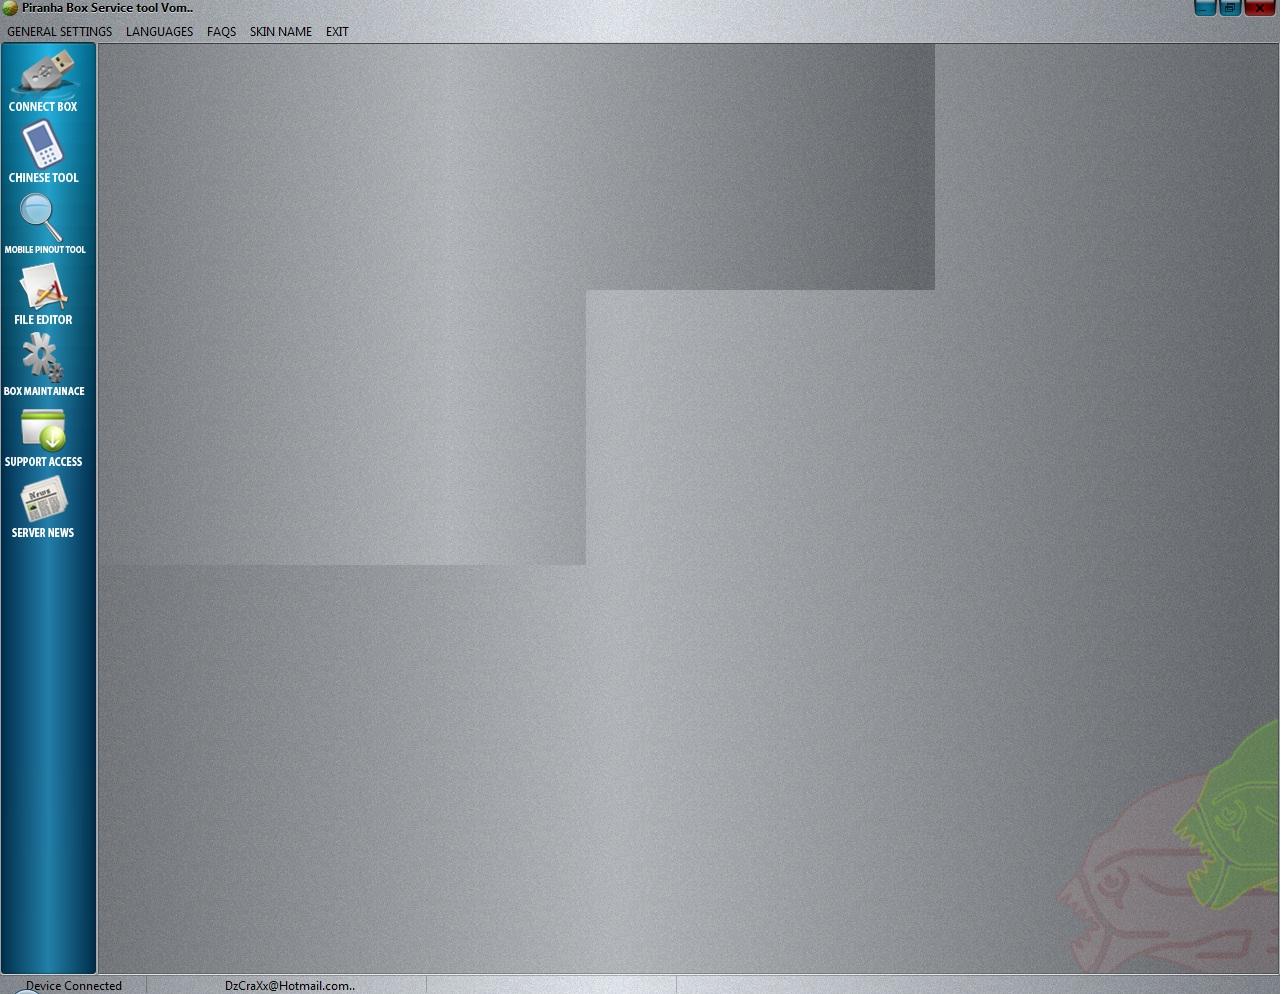 Piranha Box Crack 1.46 X273bs